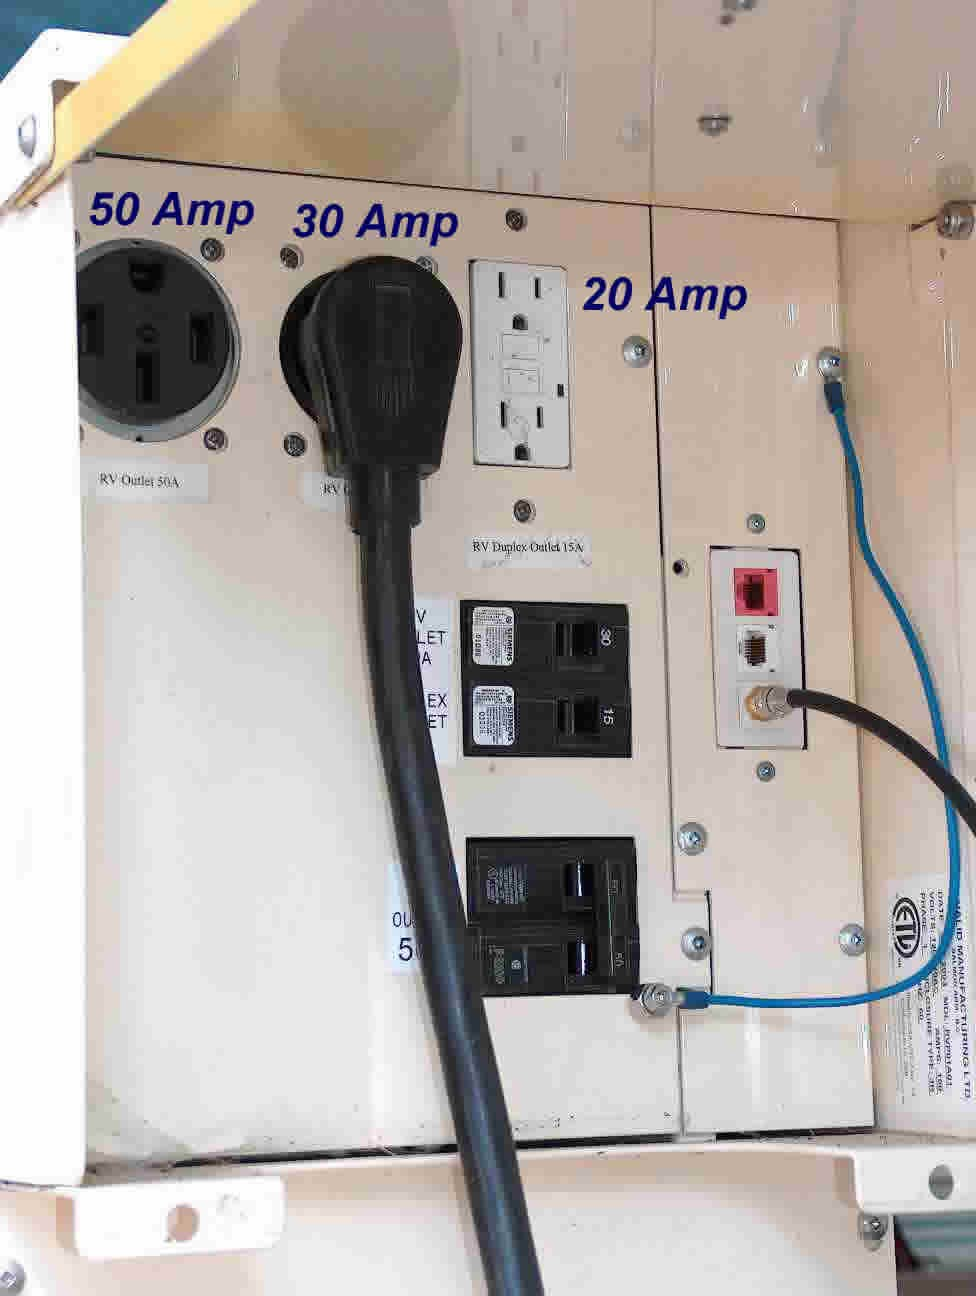 Amusing 30 Amp Rv Wiring Diagram 46 About Remodel Two Way Switch Wiring Diagram with 30 Amp Rv Wiring Diagram